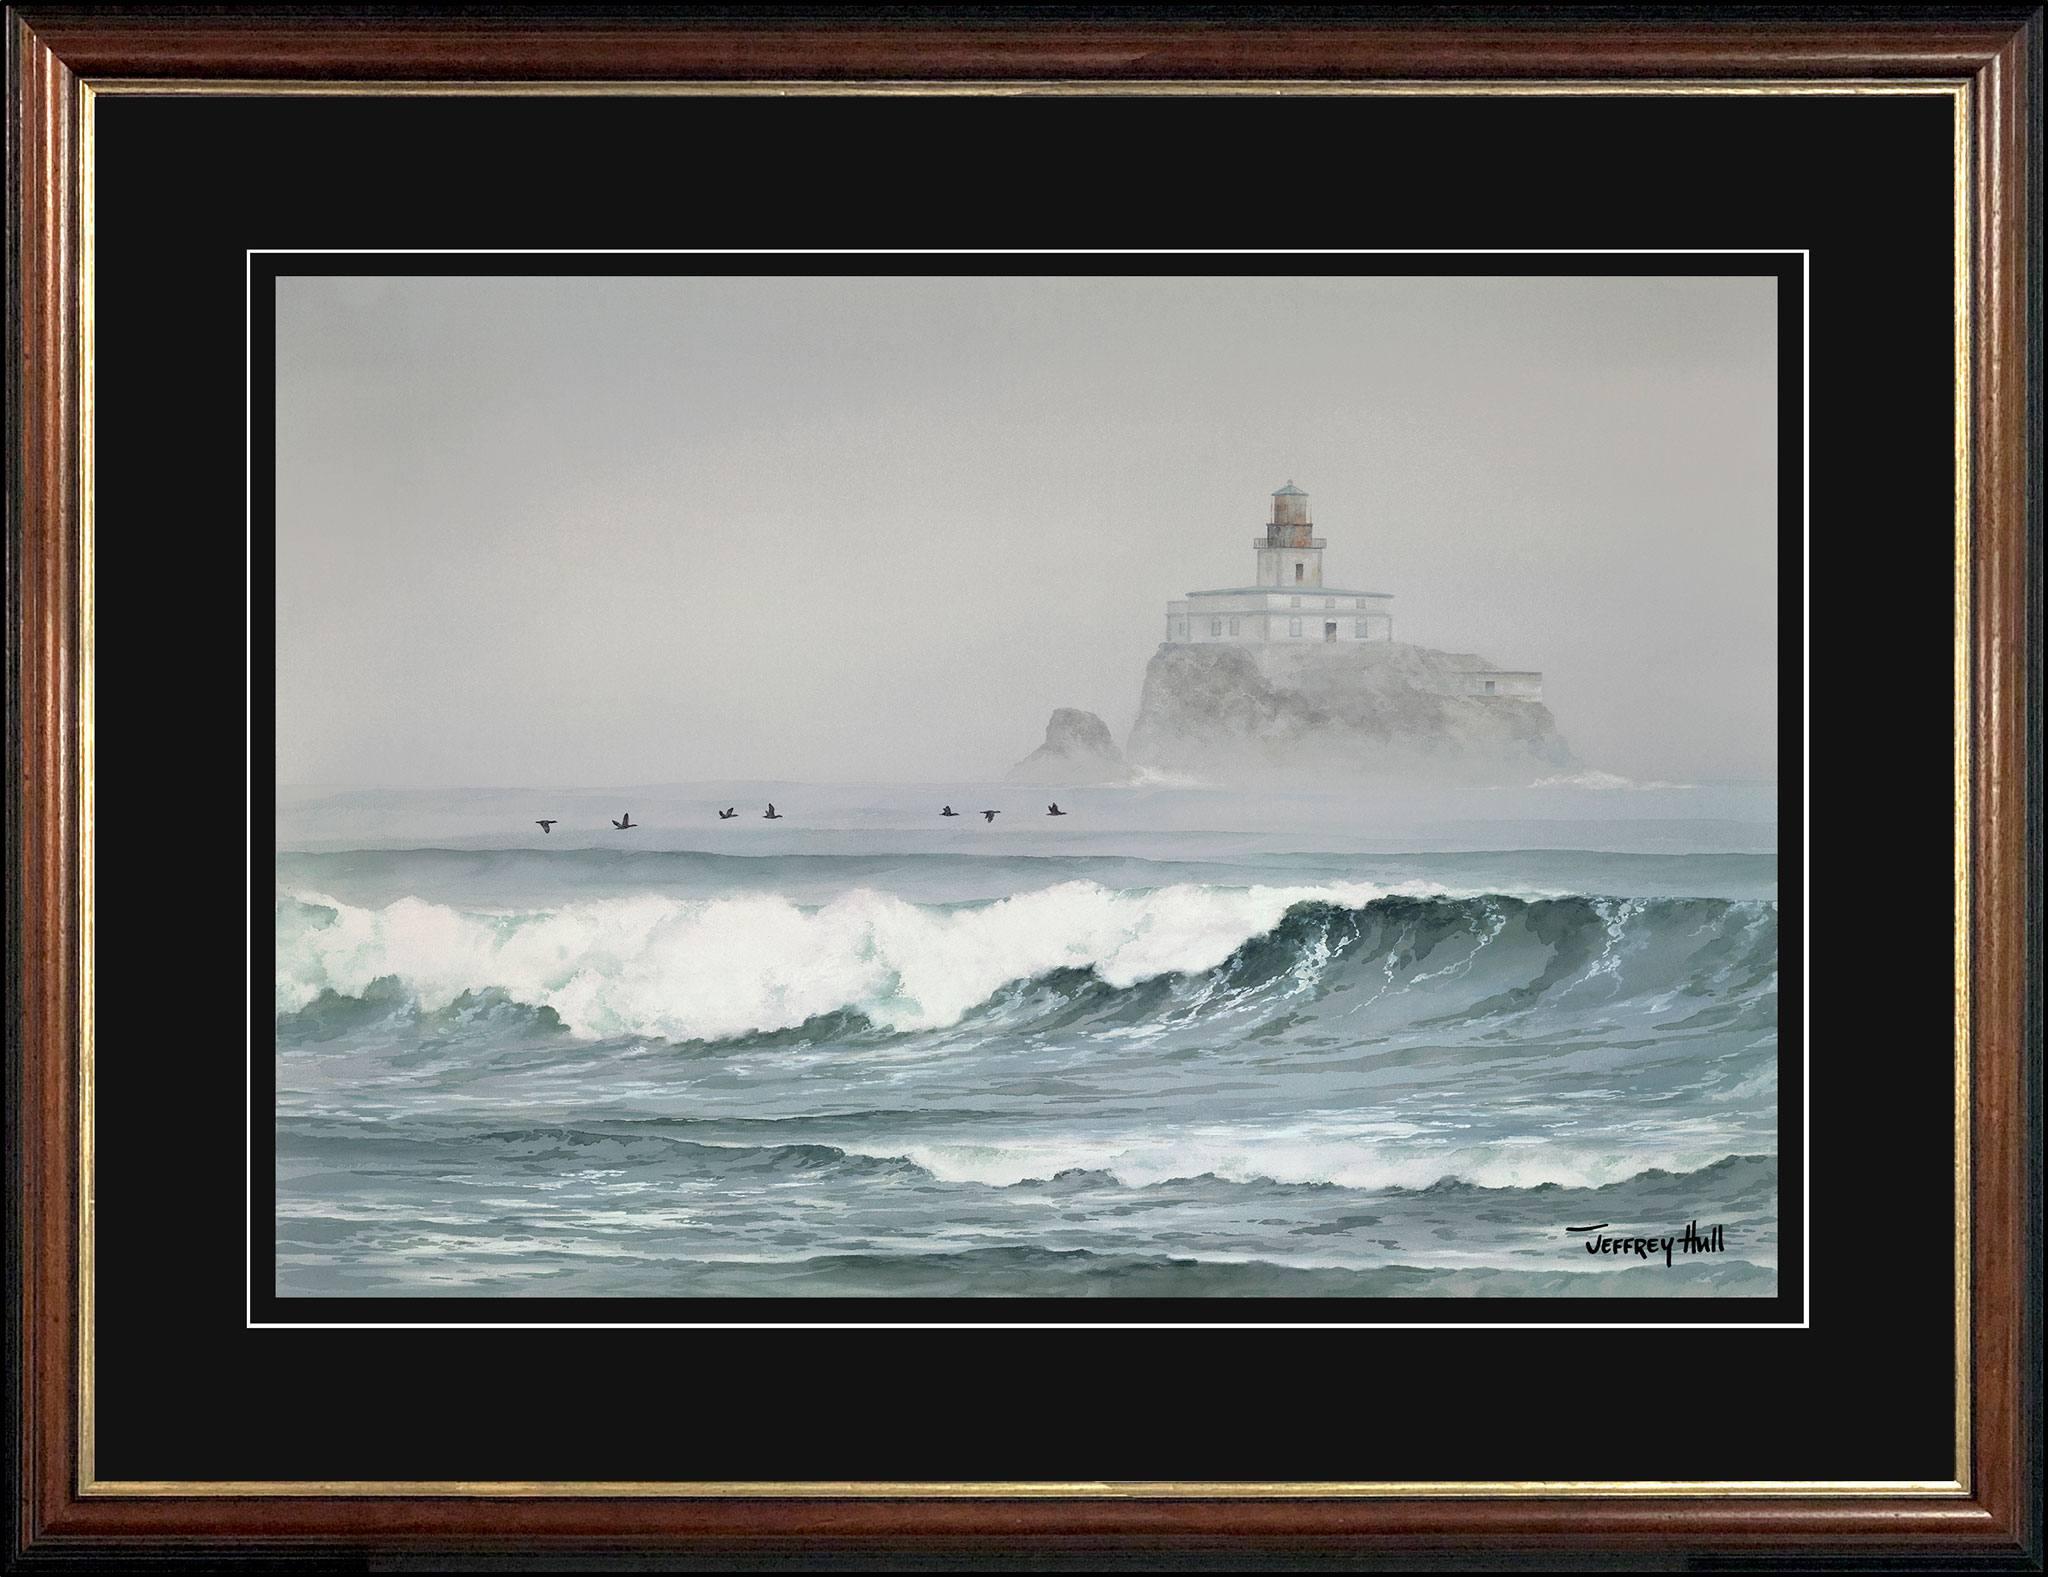 Tillamook-Rock-Lighthouse-LimEd-Malabar-Jet-Black-4-Website-2021